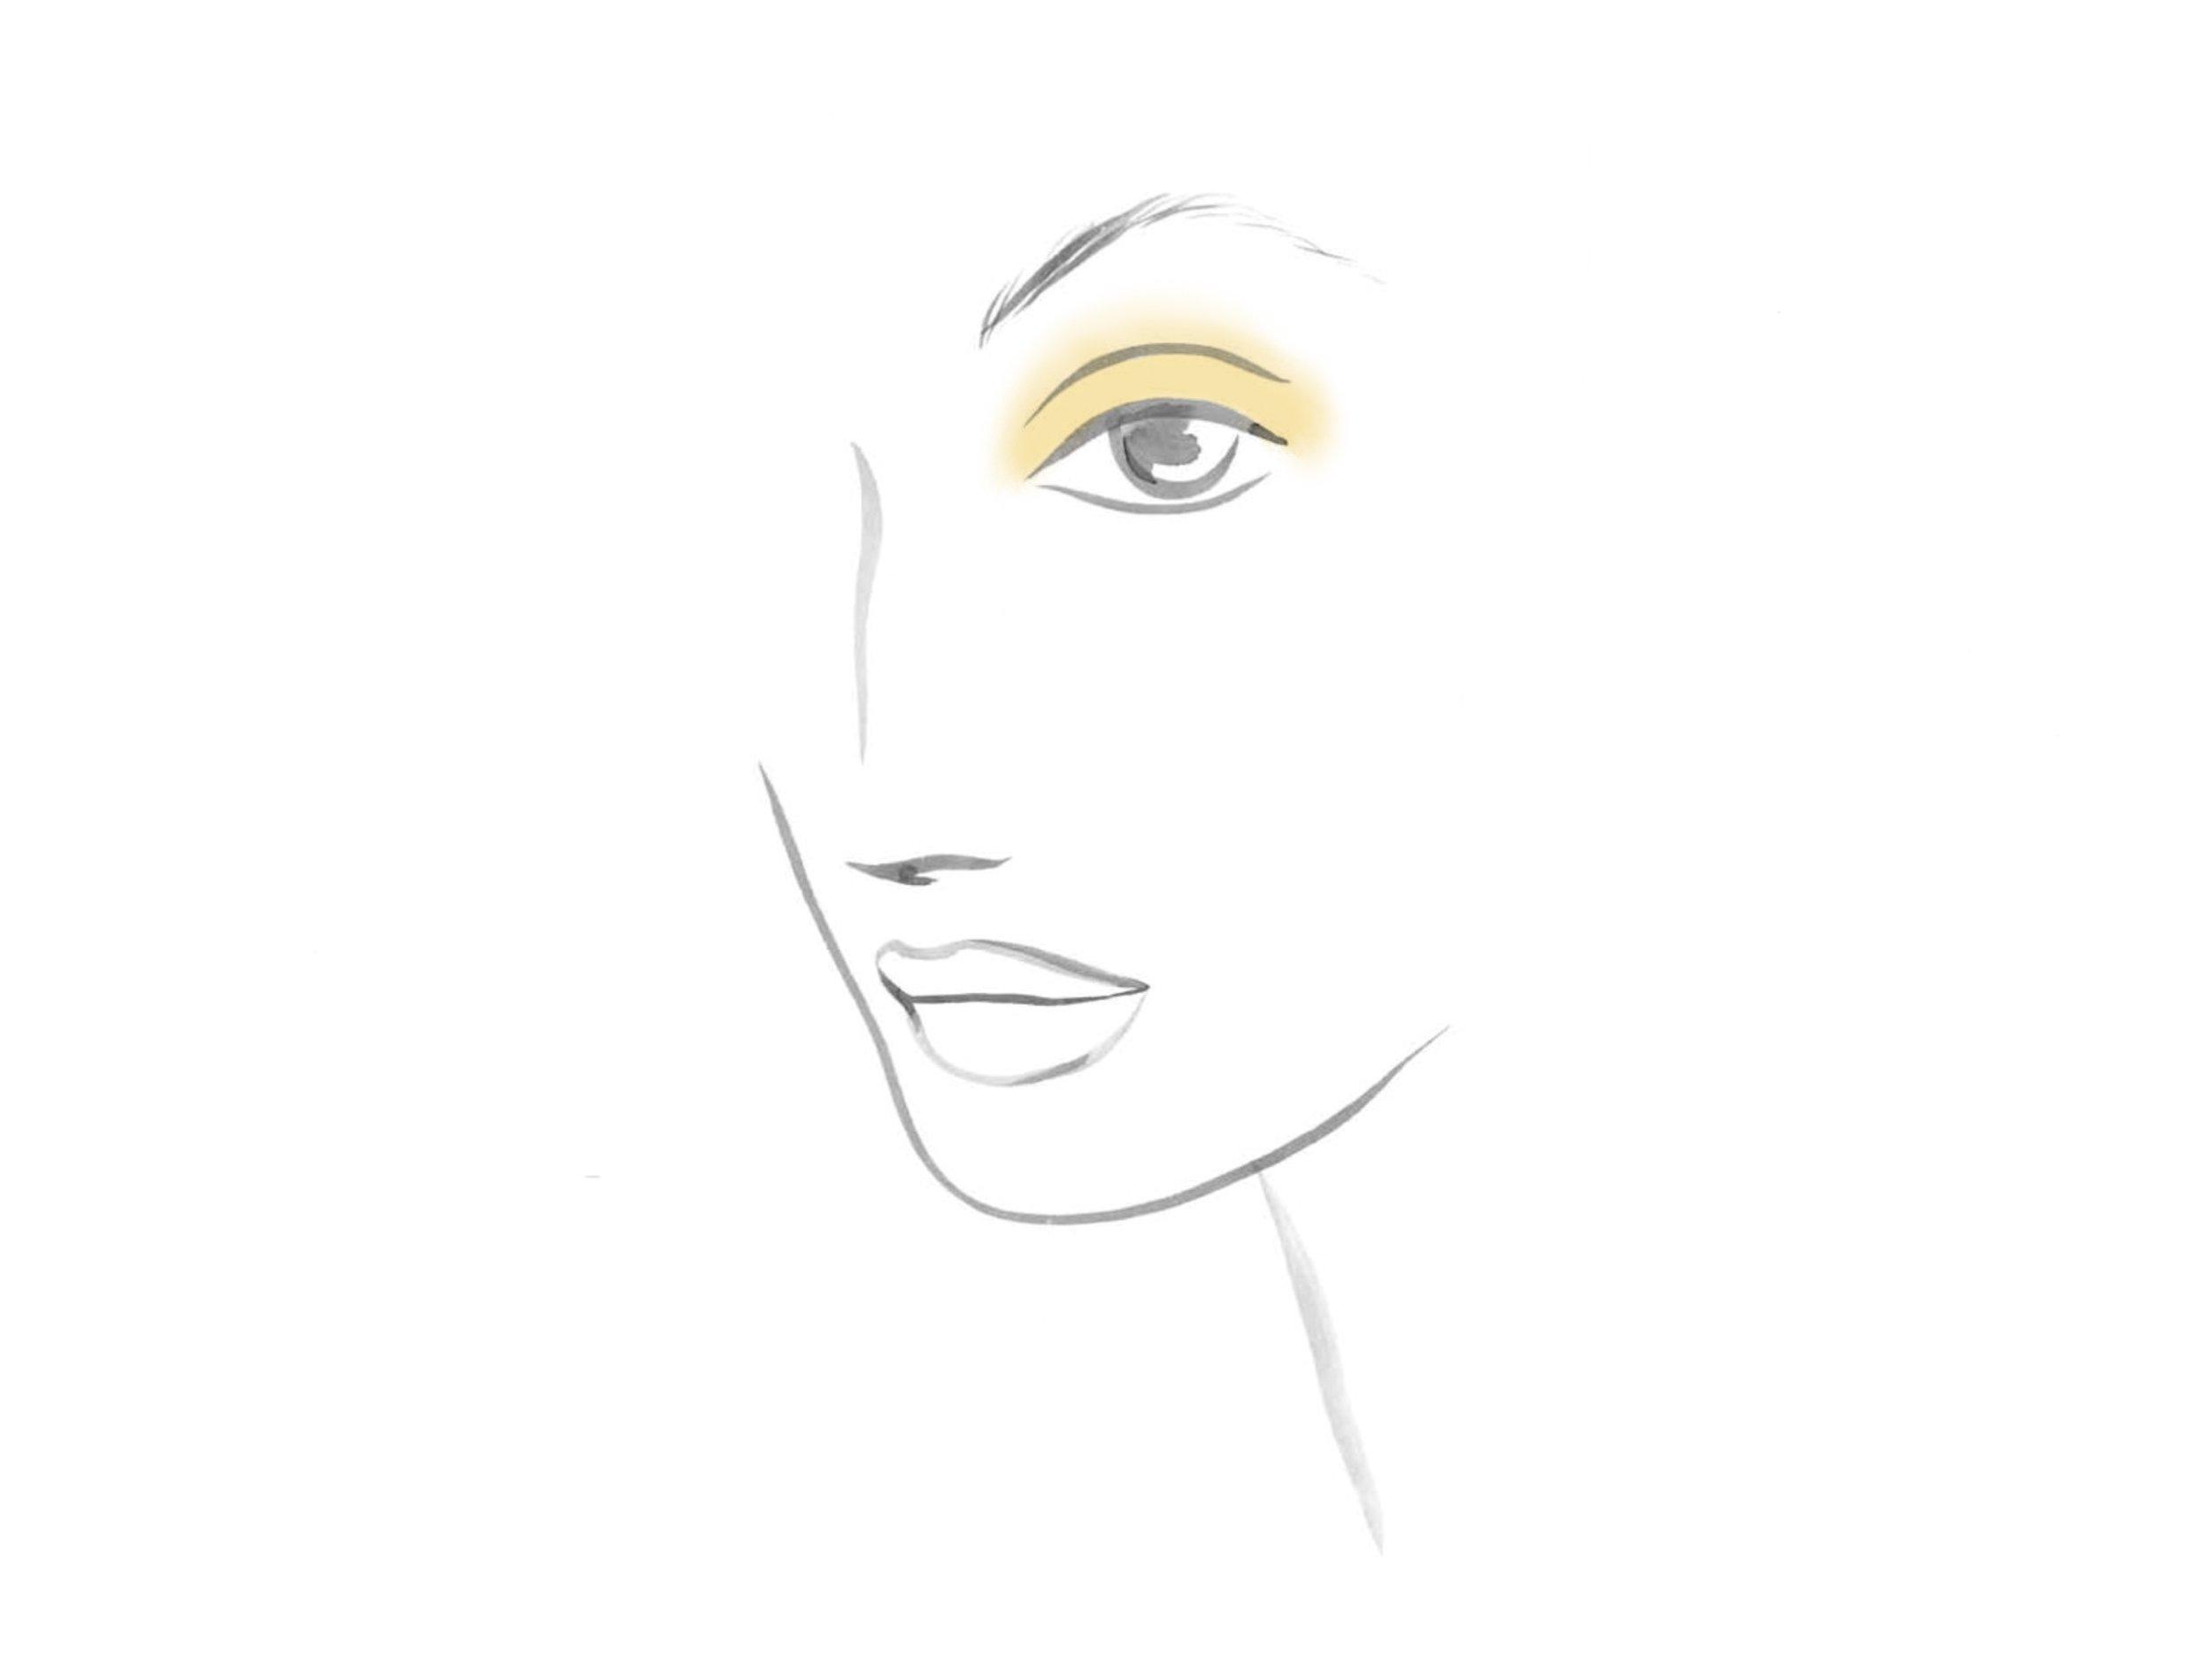 Illustration_sans_titre.jpg